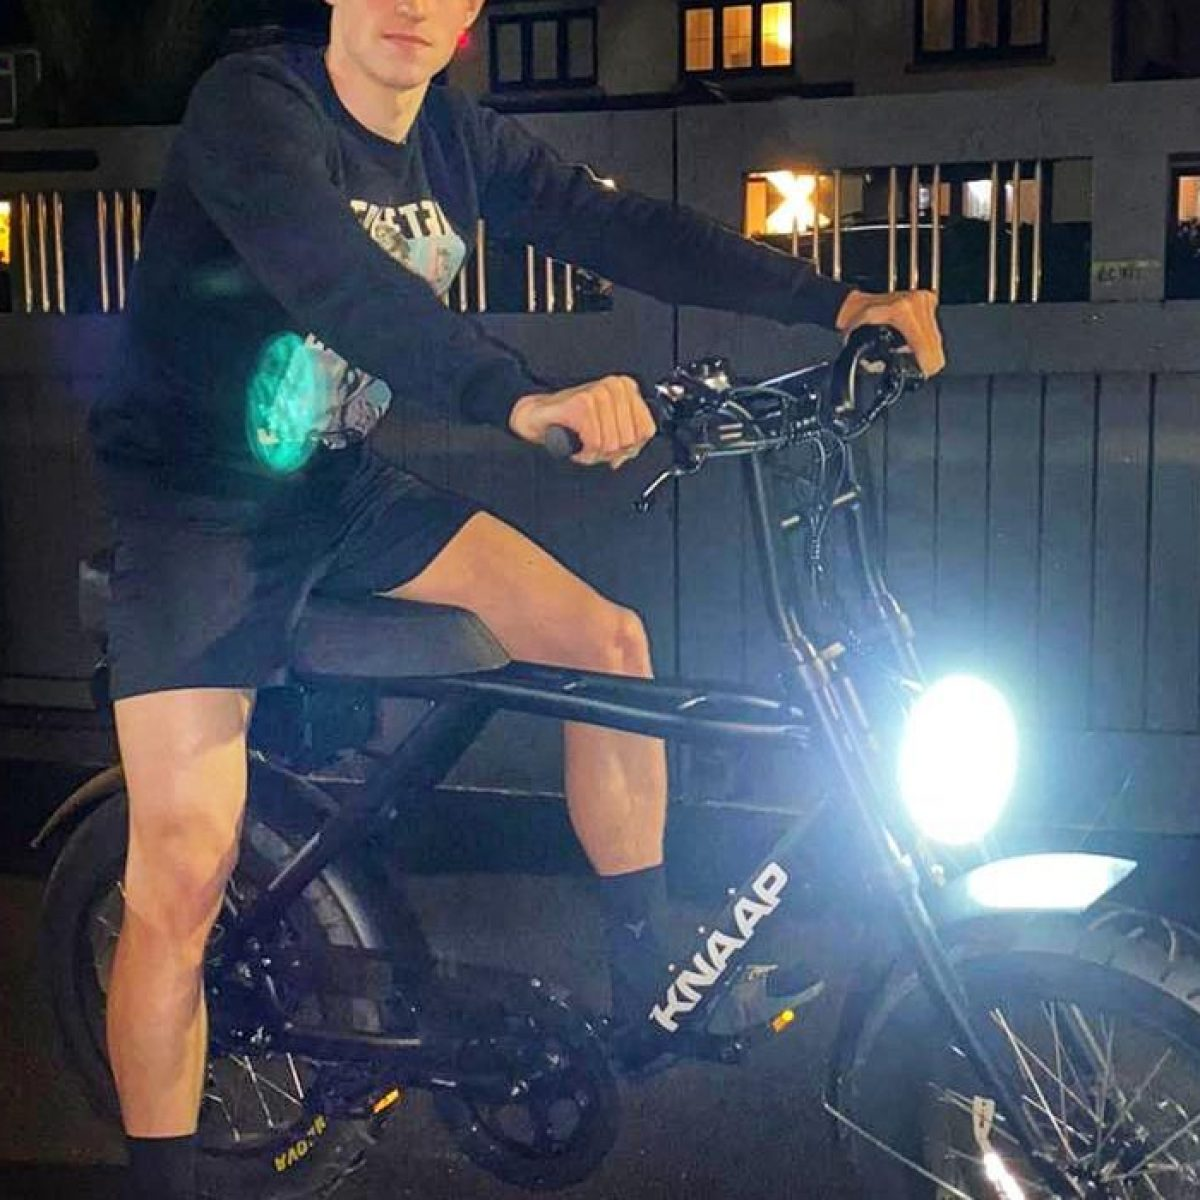 Knaap Bike_dark night